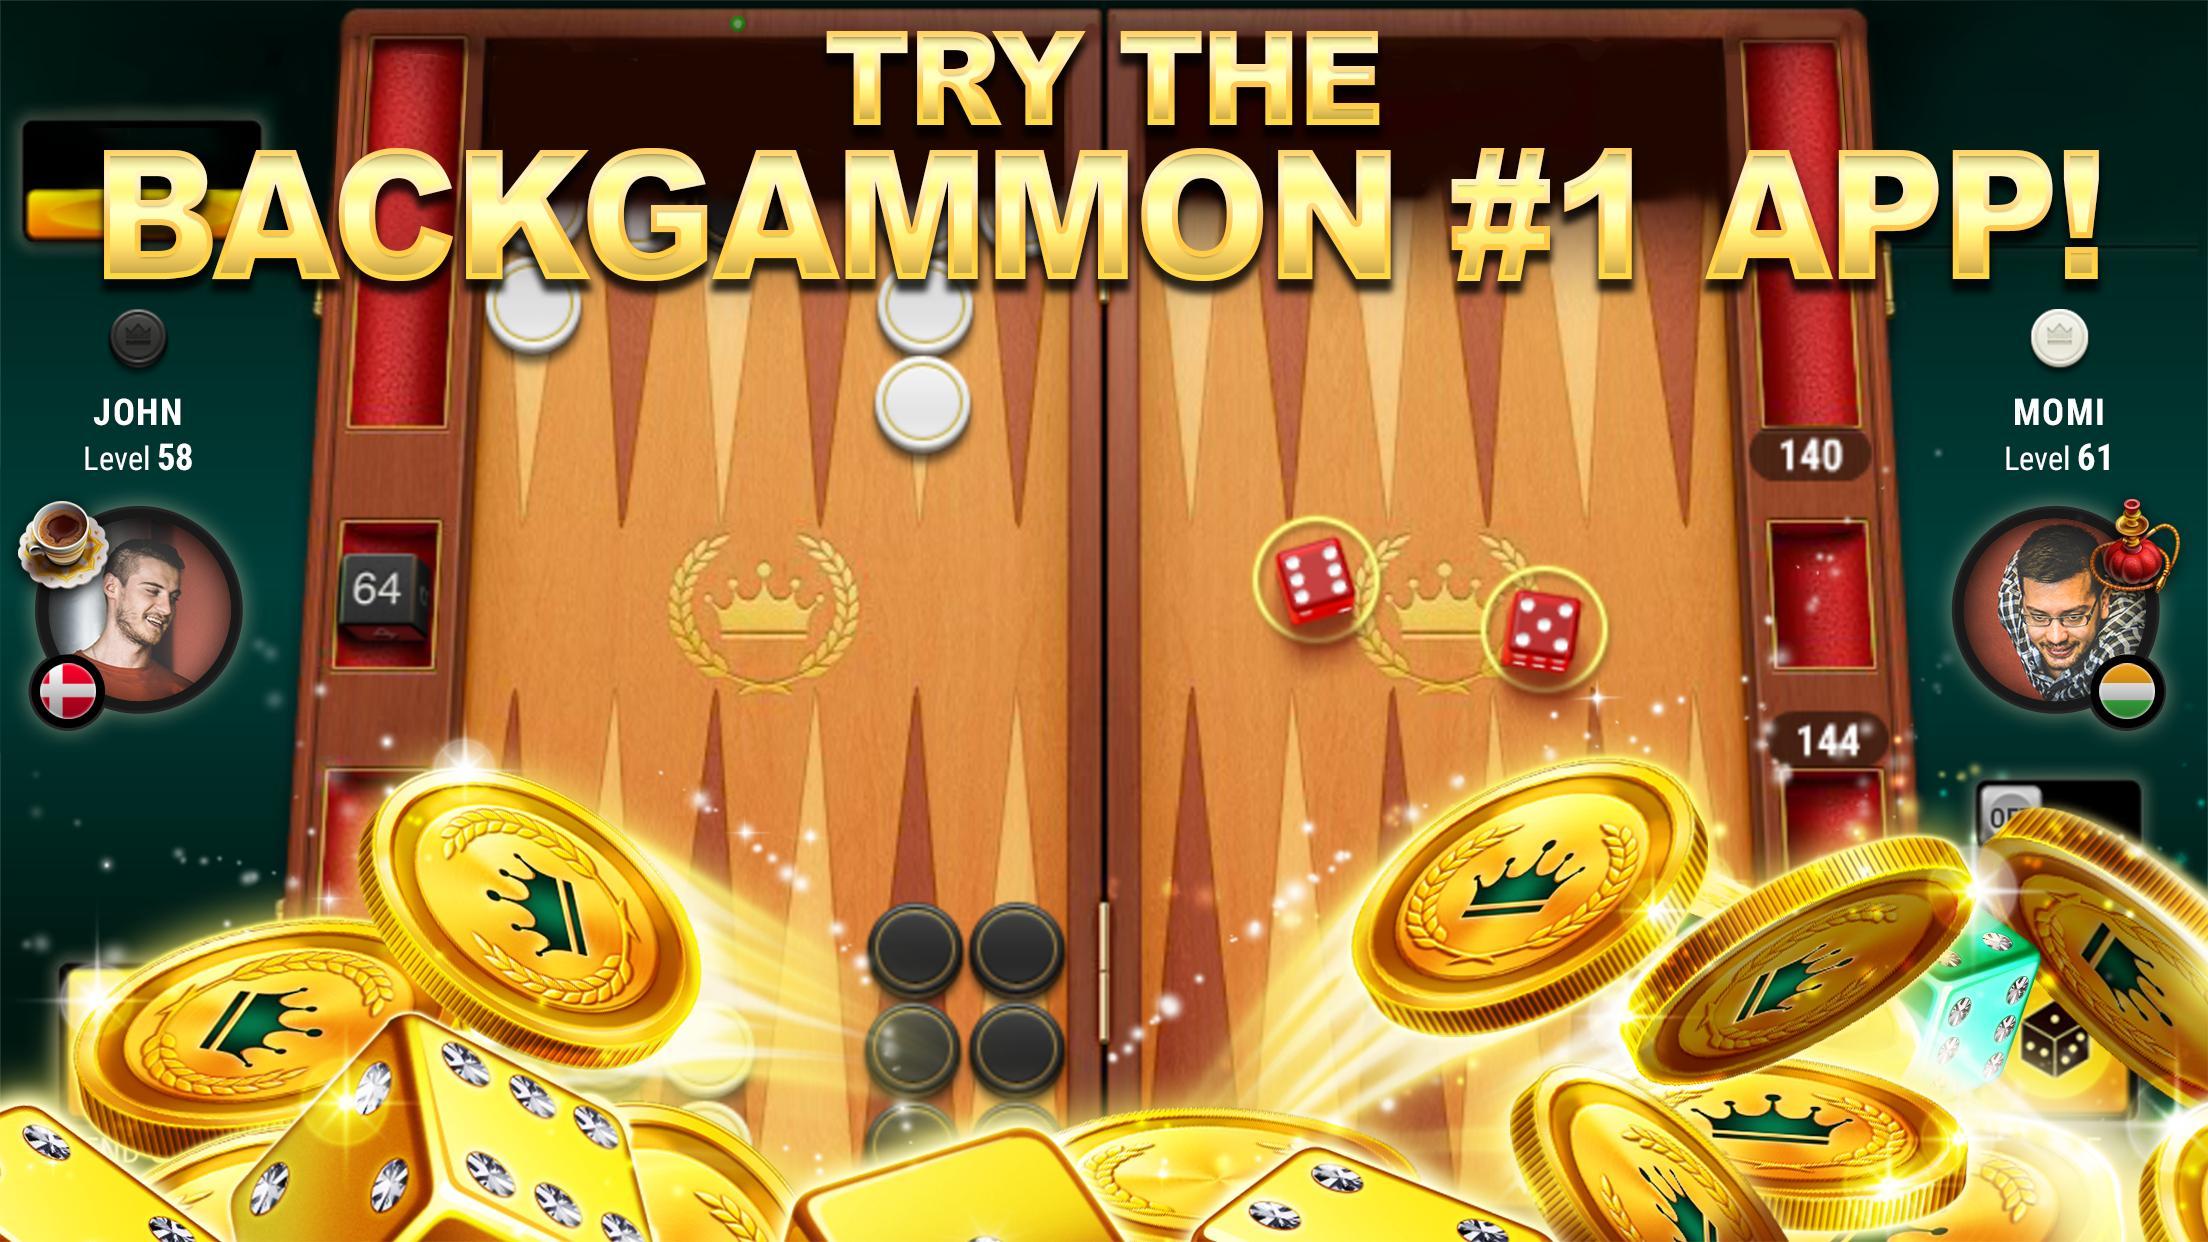 Backgammon Live - Play Online Free Backgammon 3.5.245 Screenshot 5